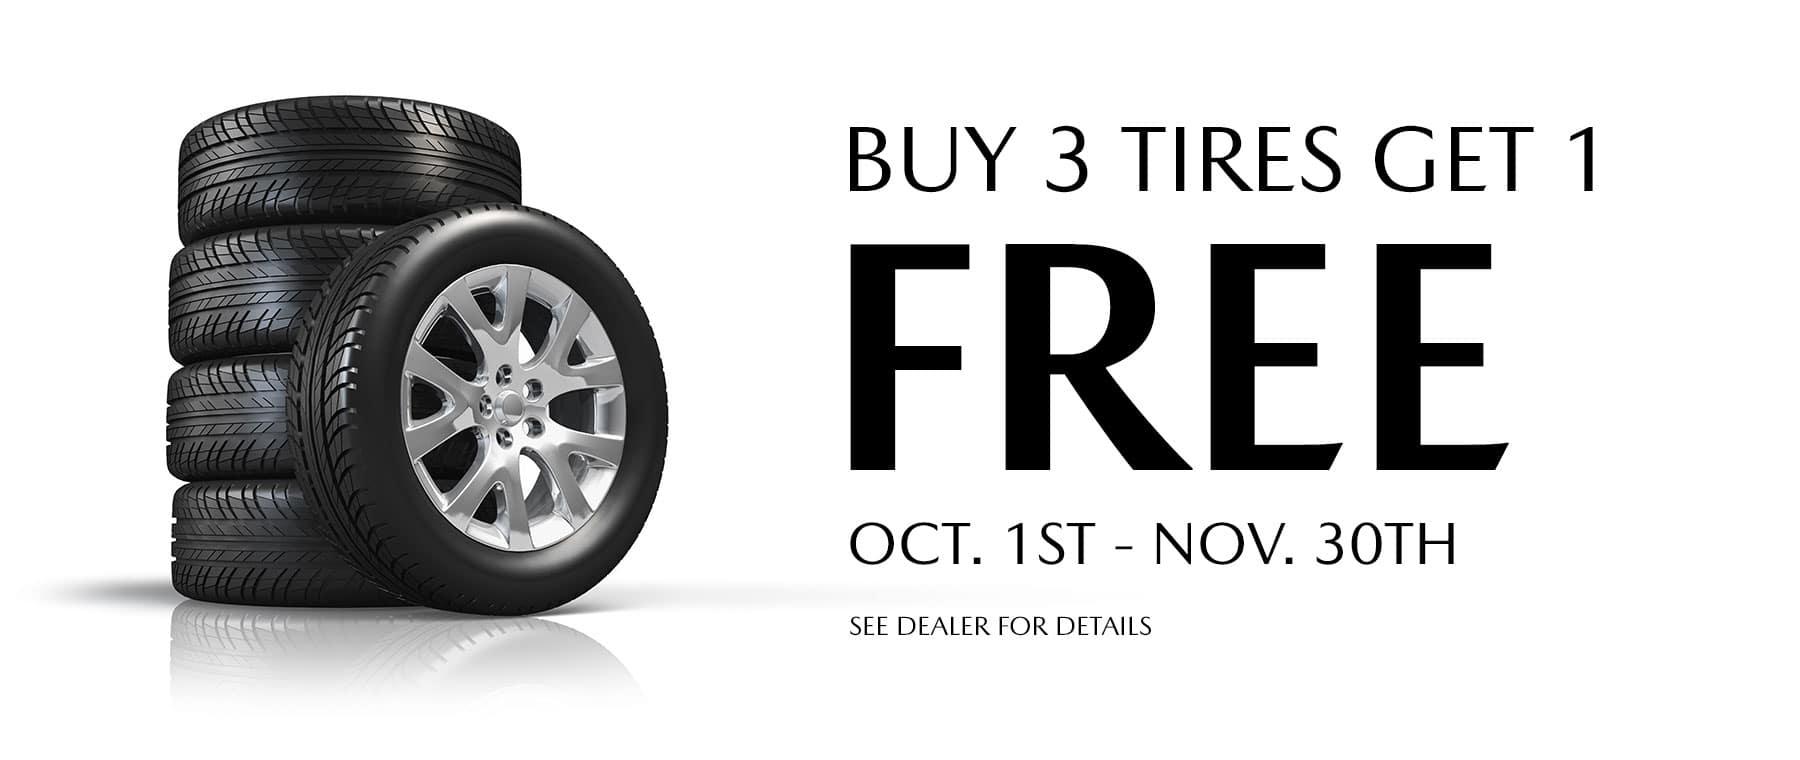 Buy 3 Tires Get 1 Free! Subtext: Oct. 1st - Nov. 30